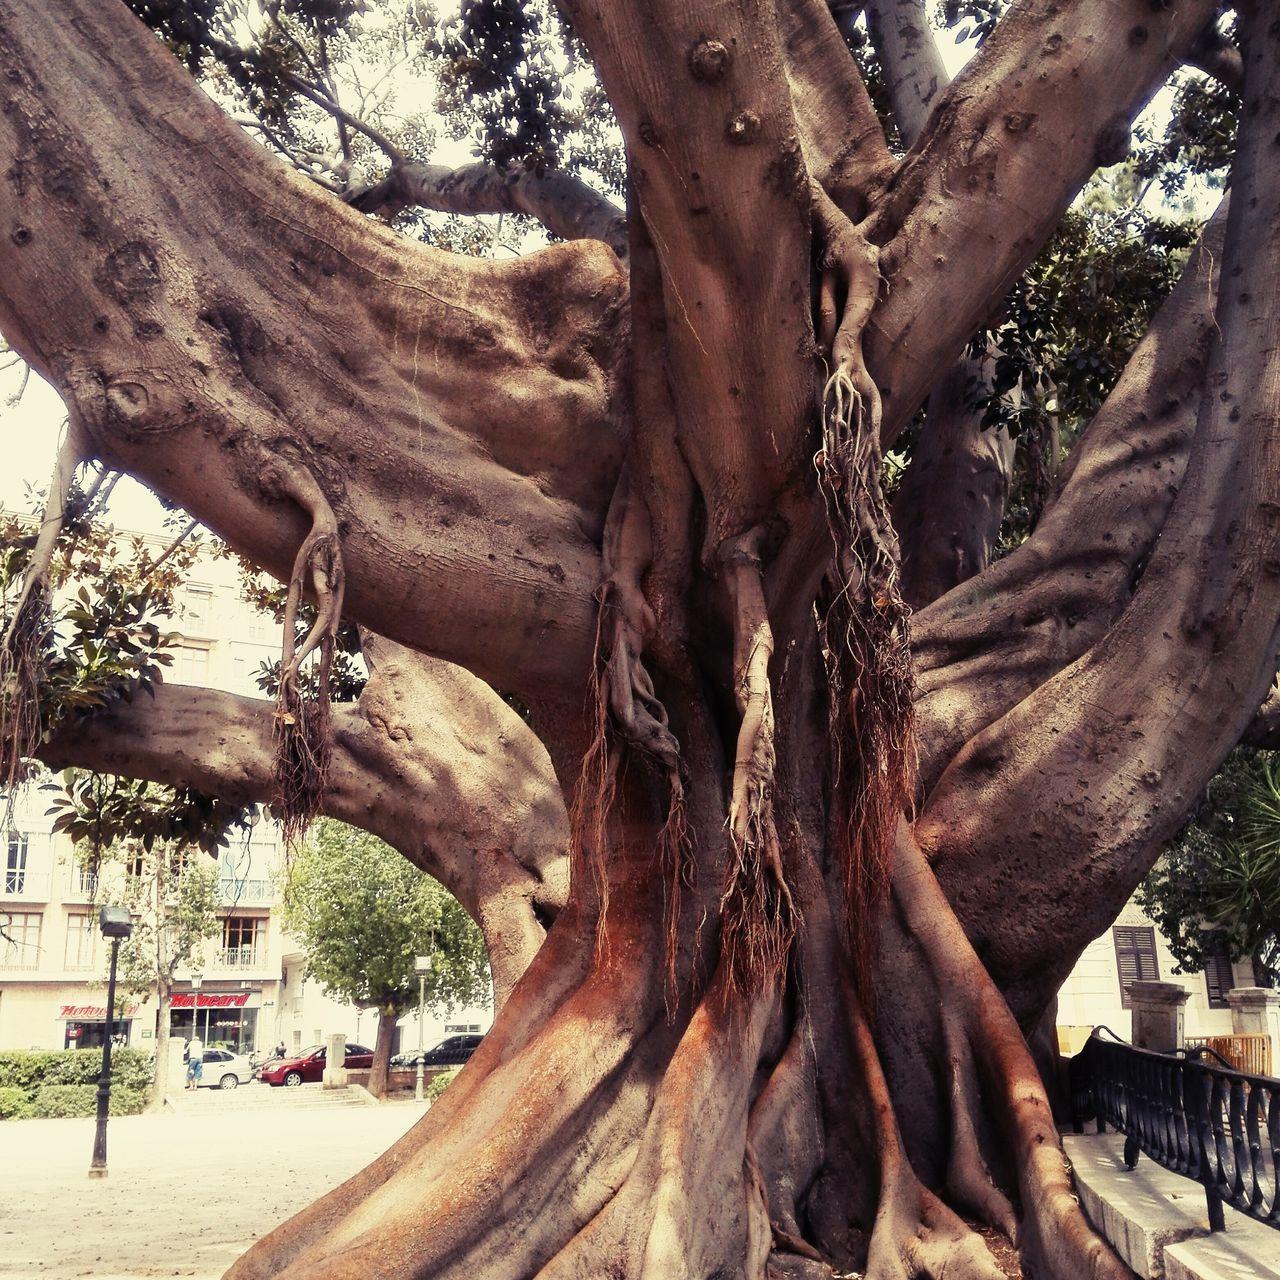 Treeoflife Evolutionrevolution Purenature Loveatfirstsight